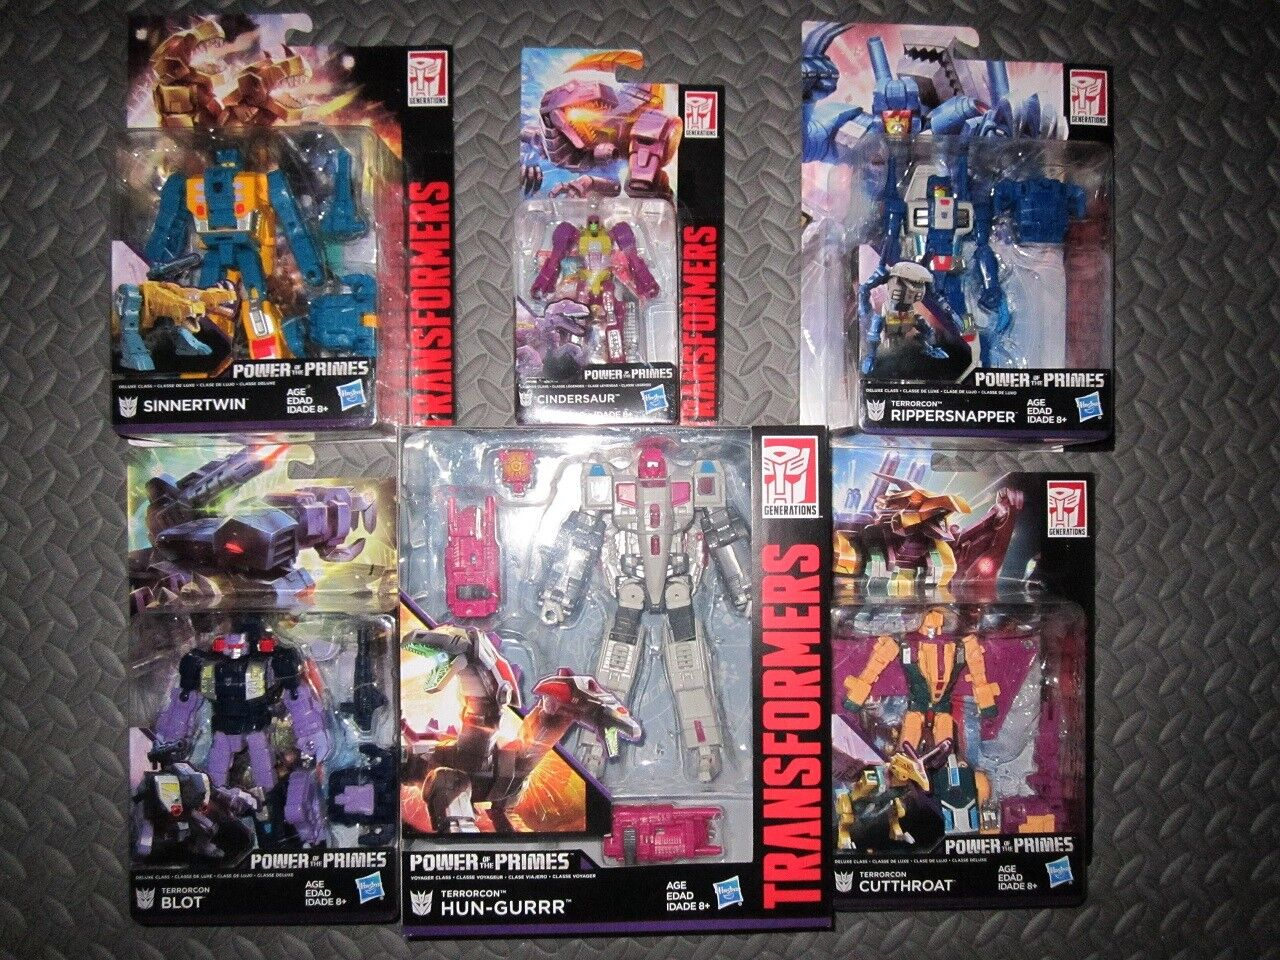 Hasbro Transformers Power of the Primes Abomination Terrorcons Set New Hun-gurrr